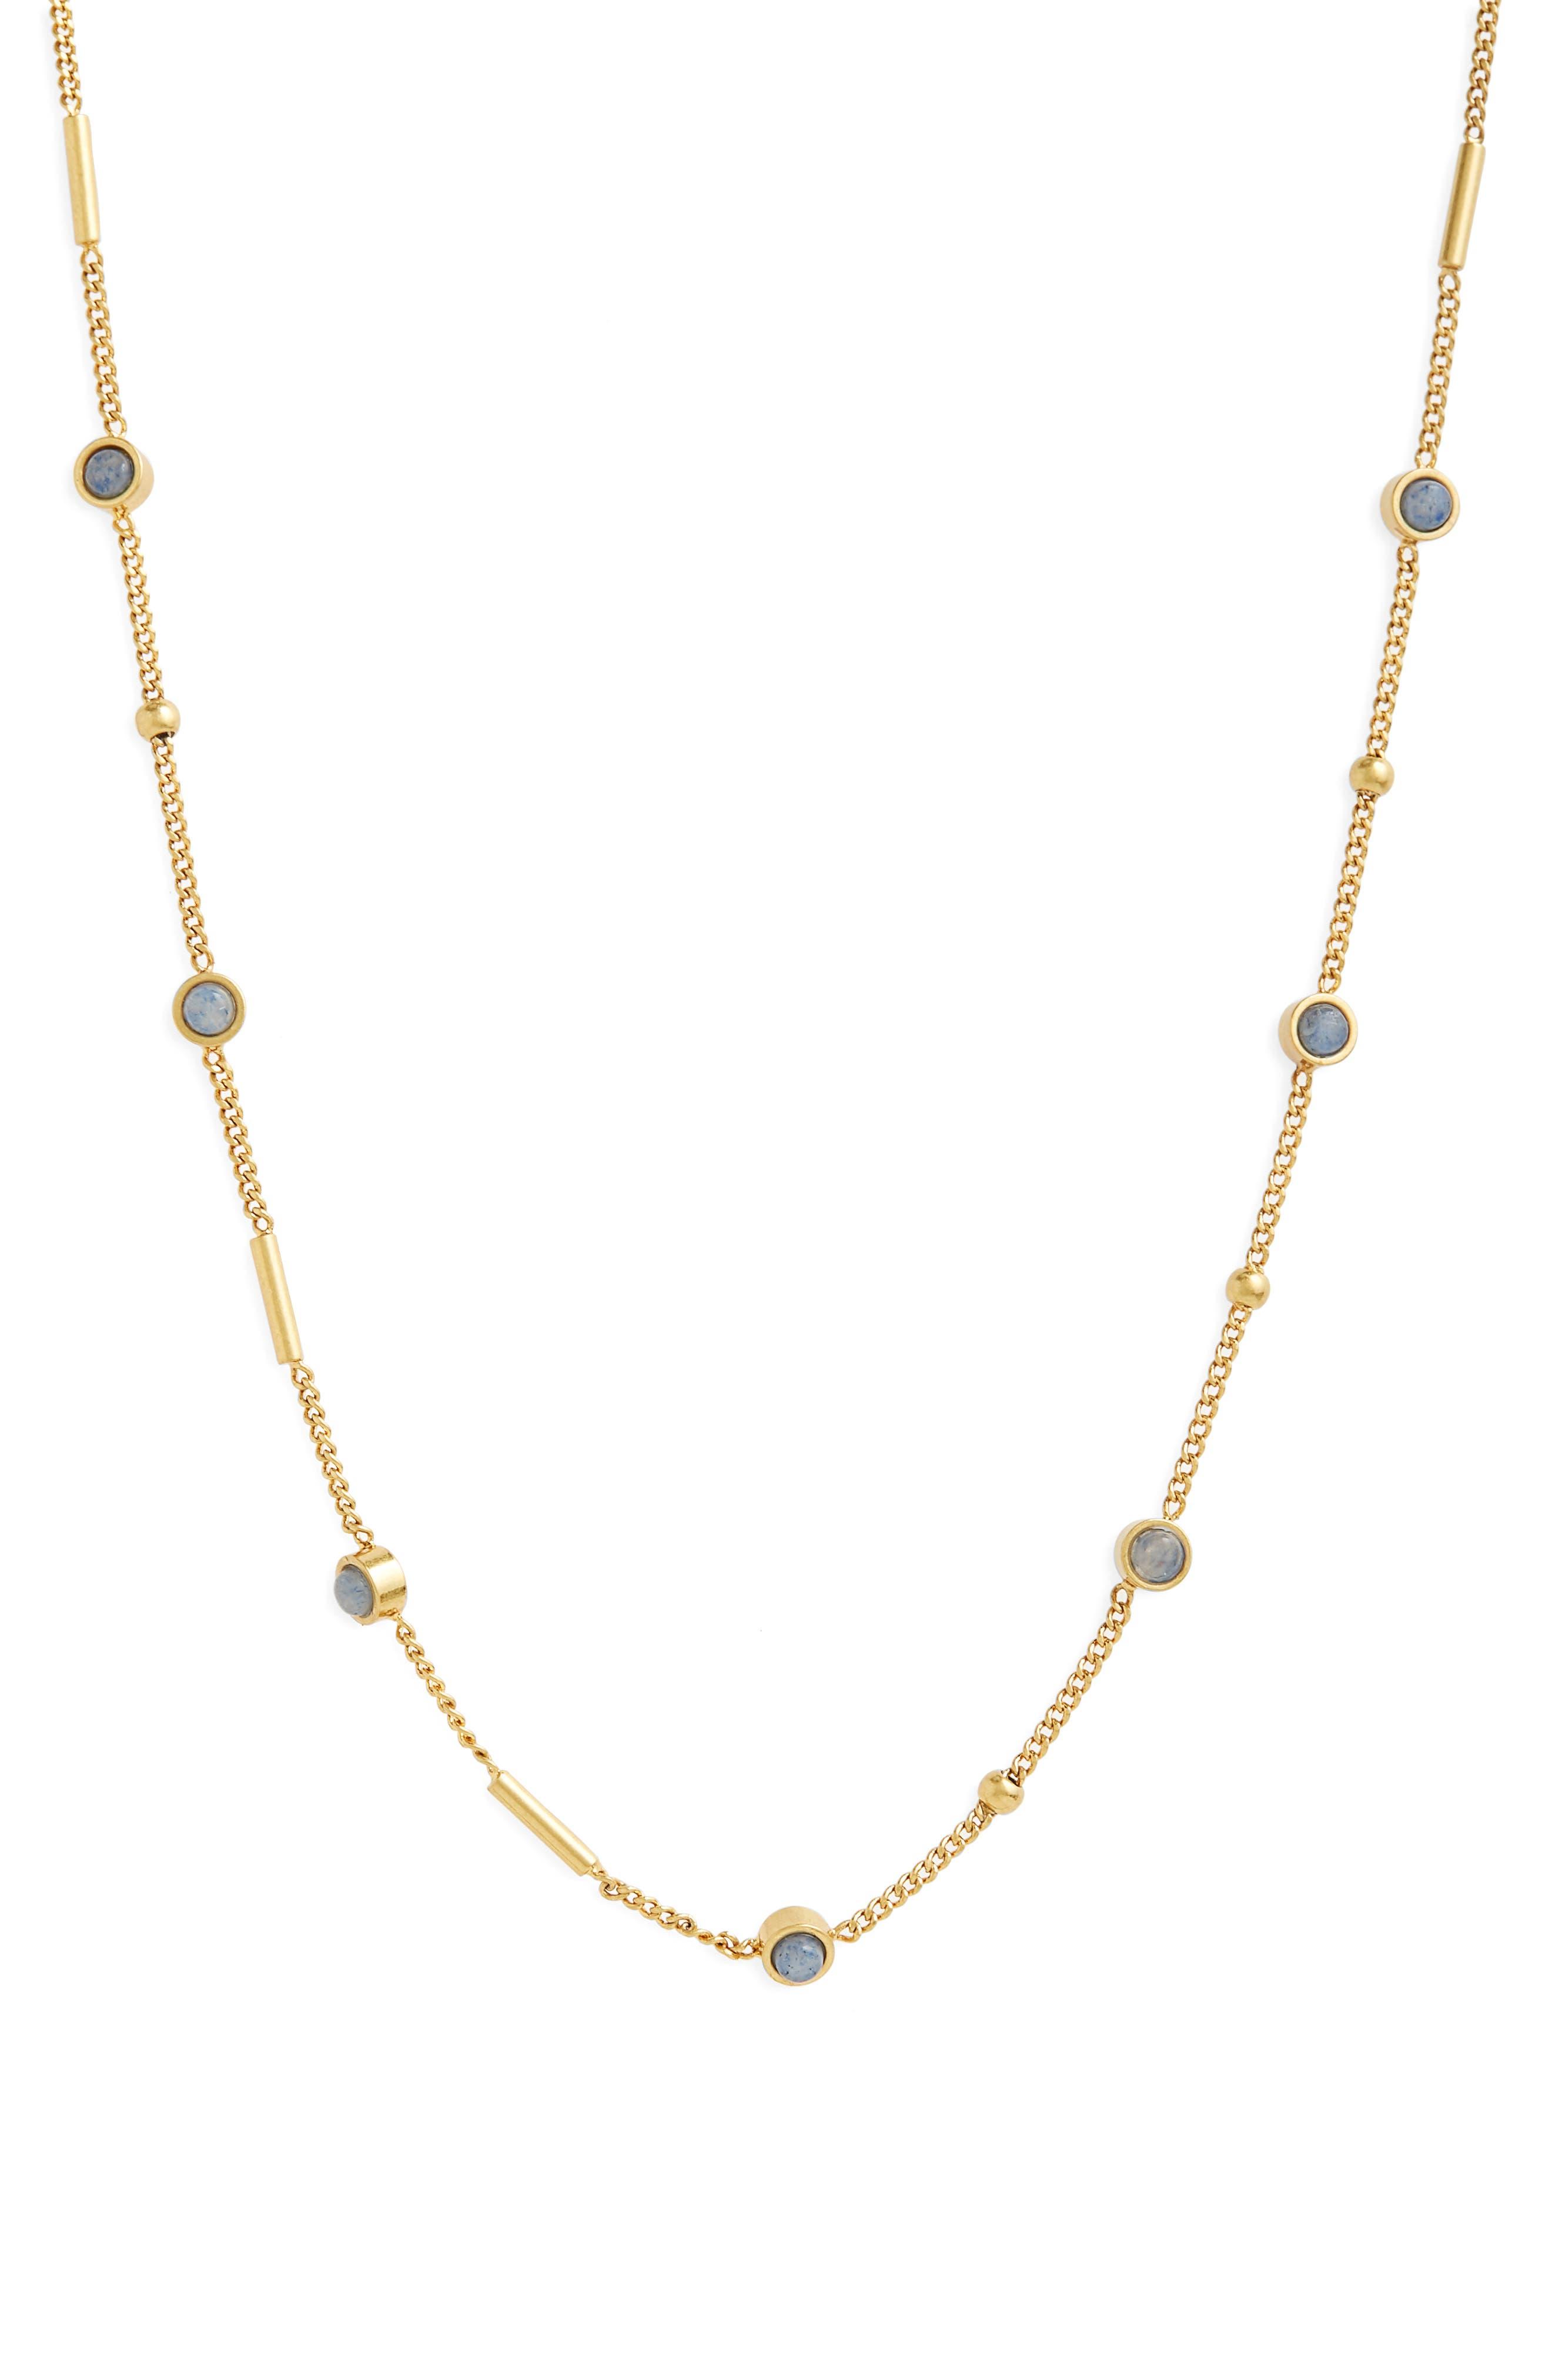 Delicate Stone Necklace,                             Main thumbnail 1, color,                             400